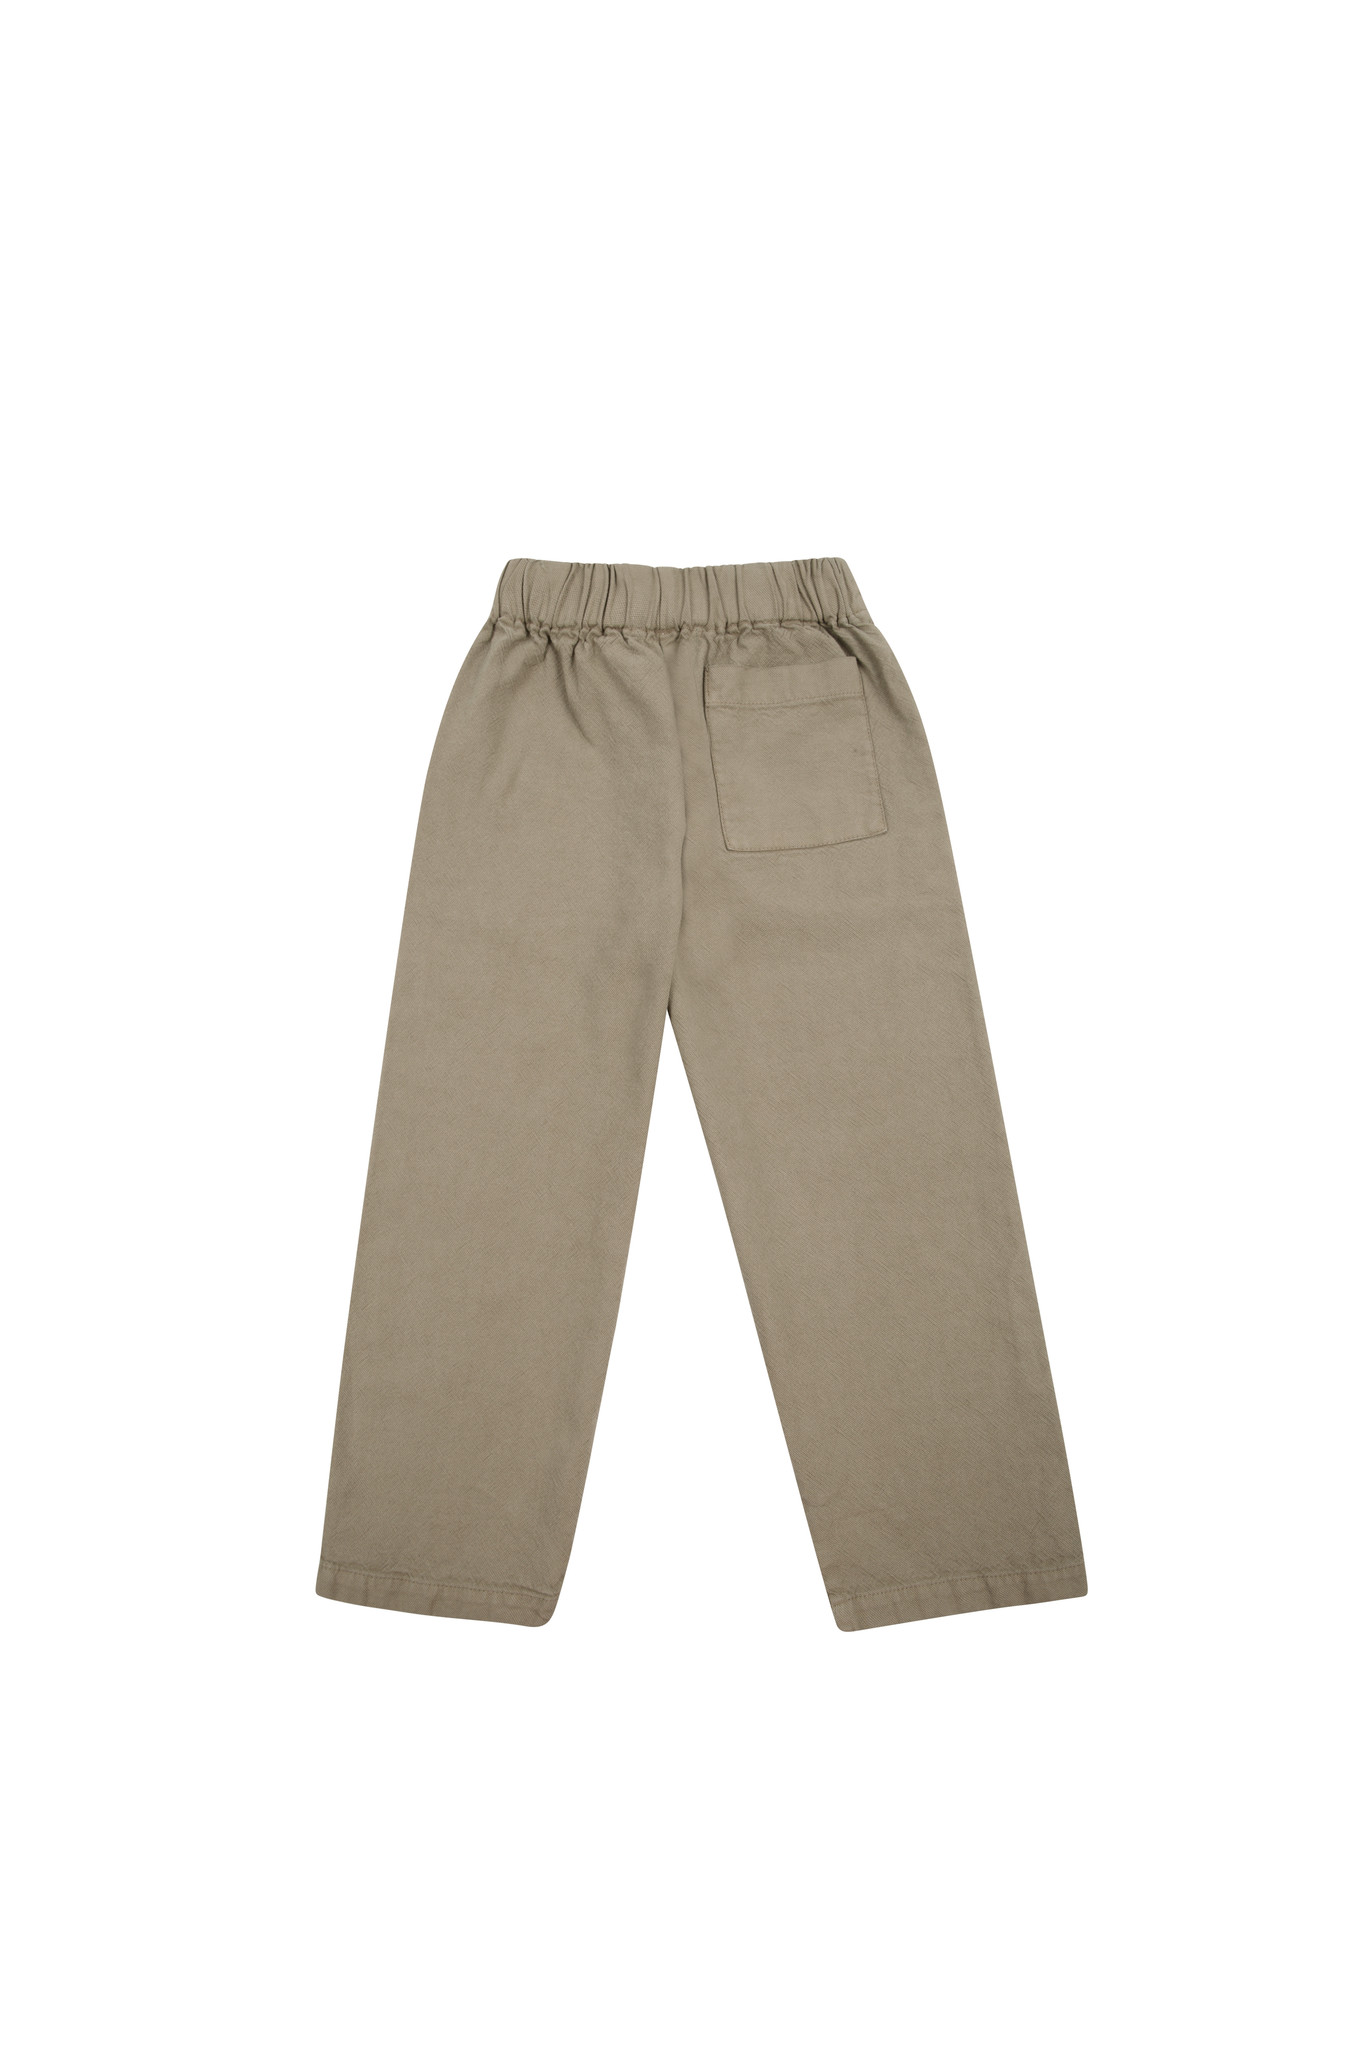 Paris pants - Khaki-2